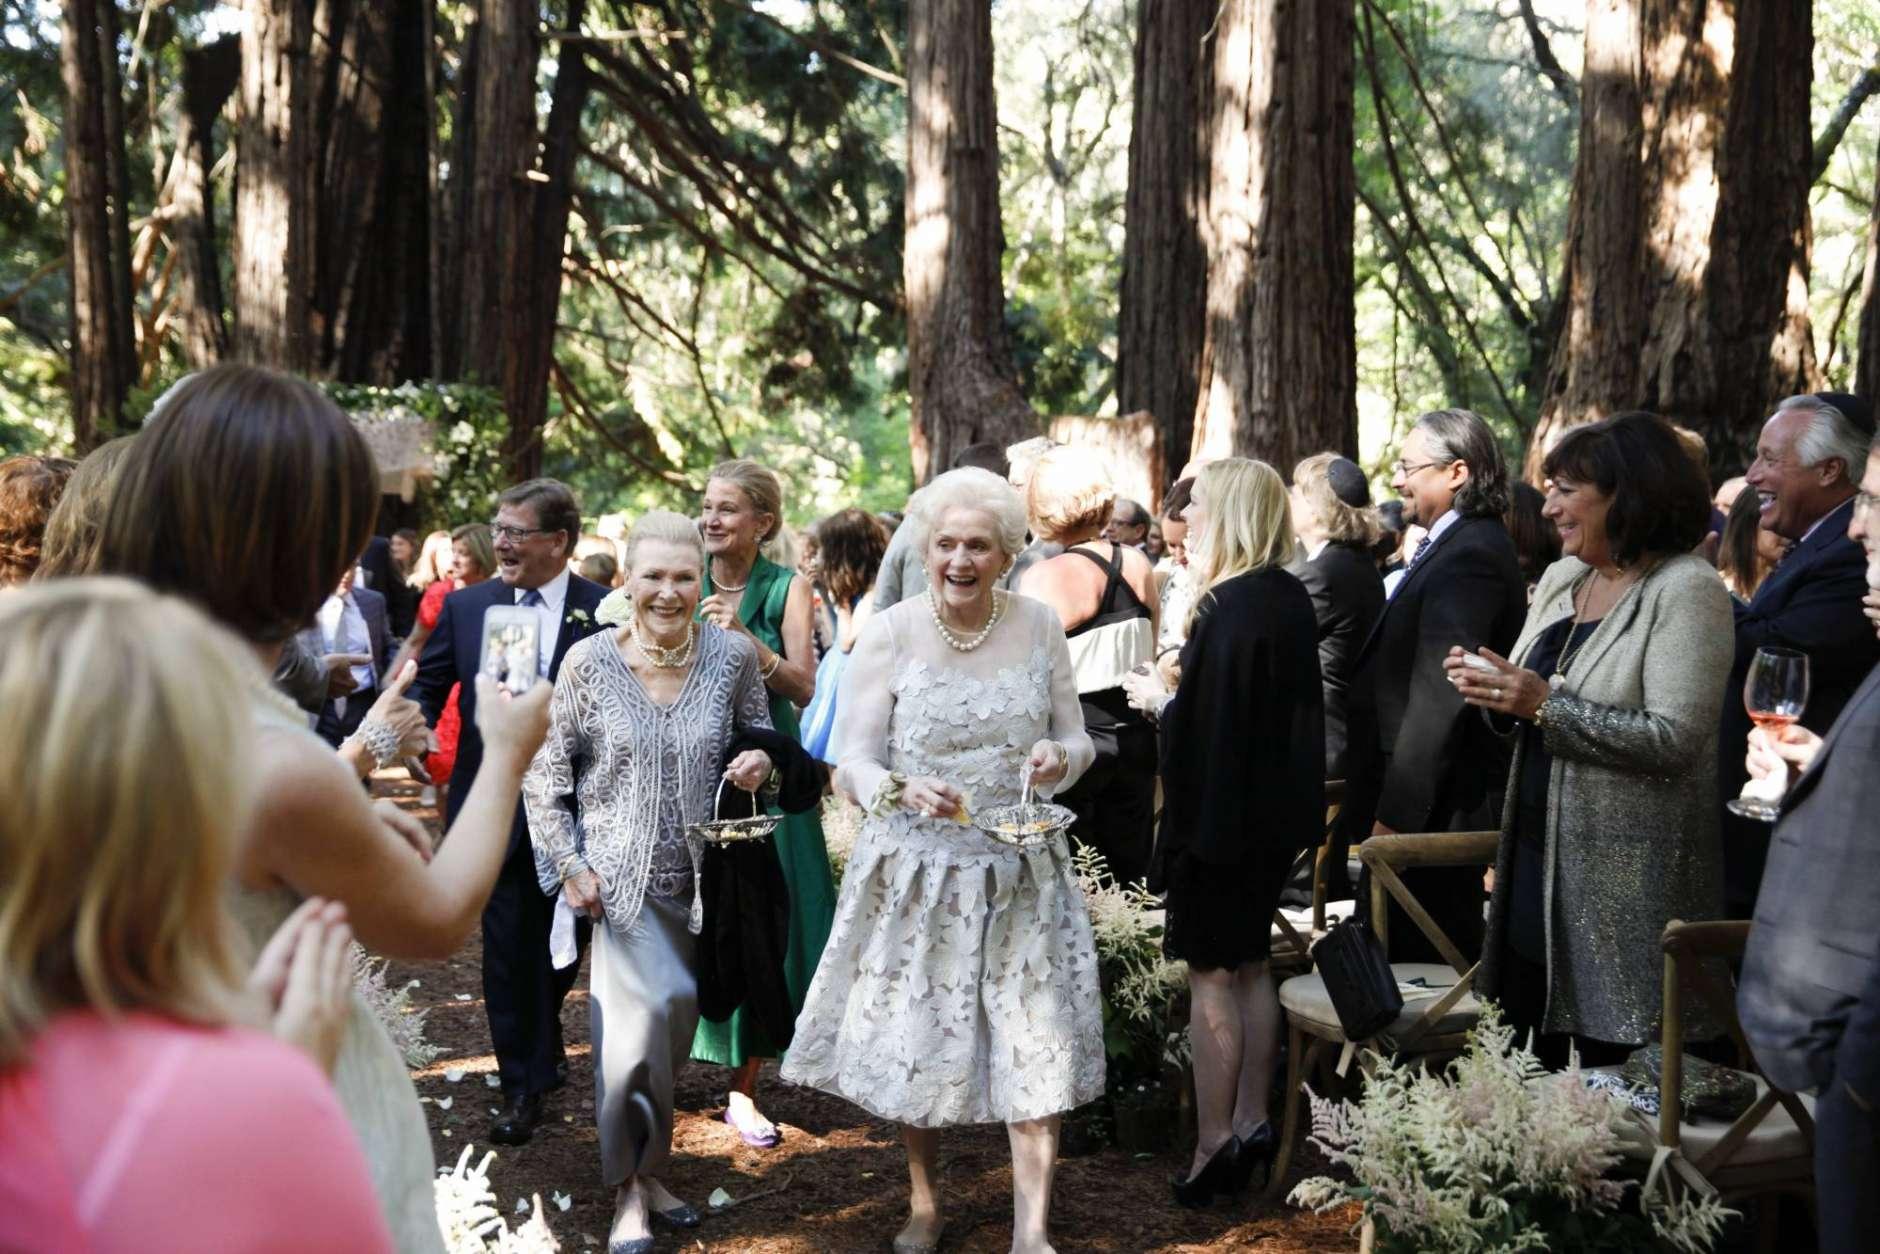 Weddings_Grandparents_54436-1880x1254.jpg